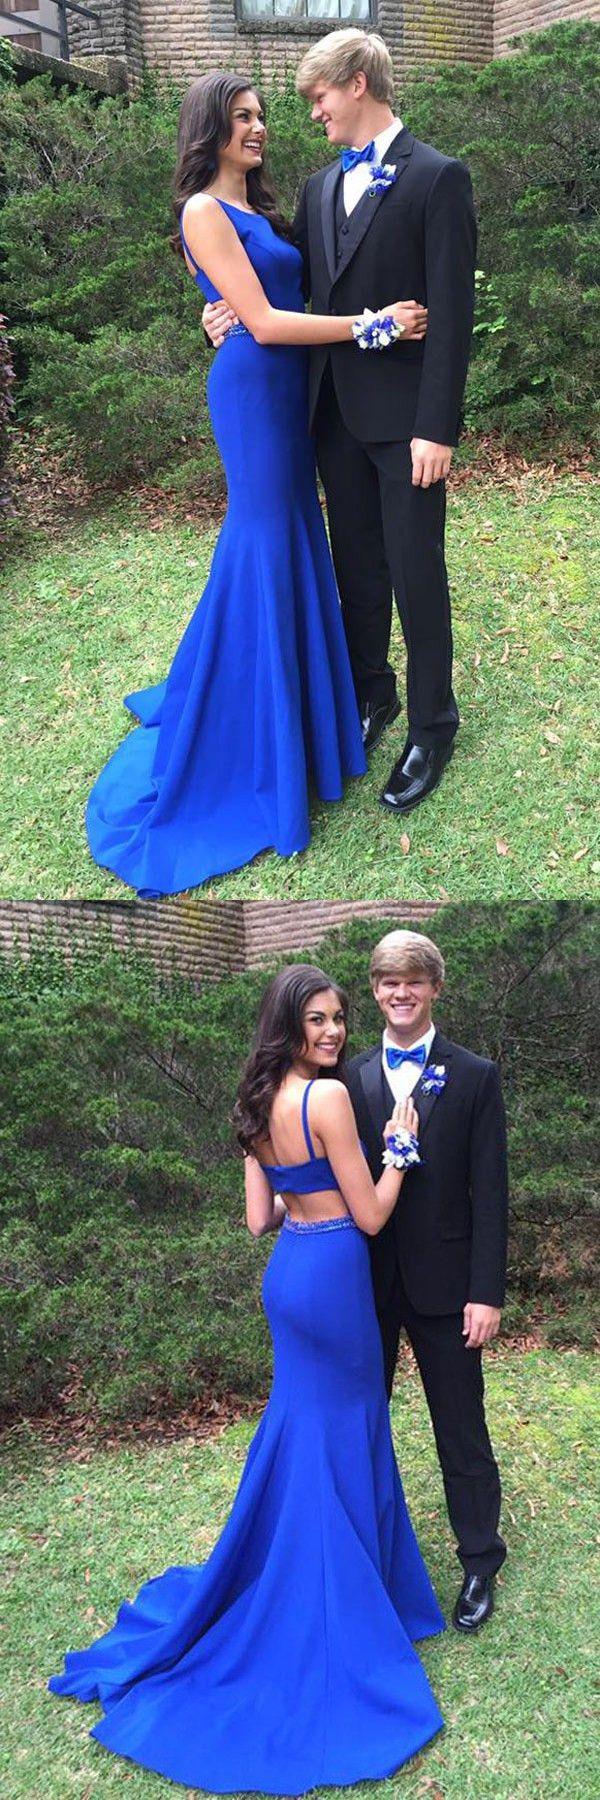 2017 prom dresses,prom dresses,royal blue prom dresses,mermaid prom dresses,simple prom dresses,party dresses,royal blue party dresses,evening dresses,elegant evening dresses,vestidos,klied